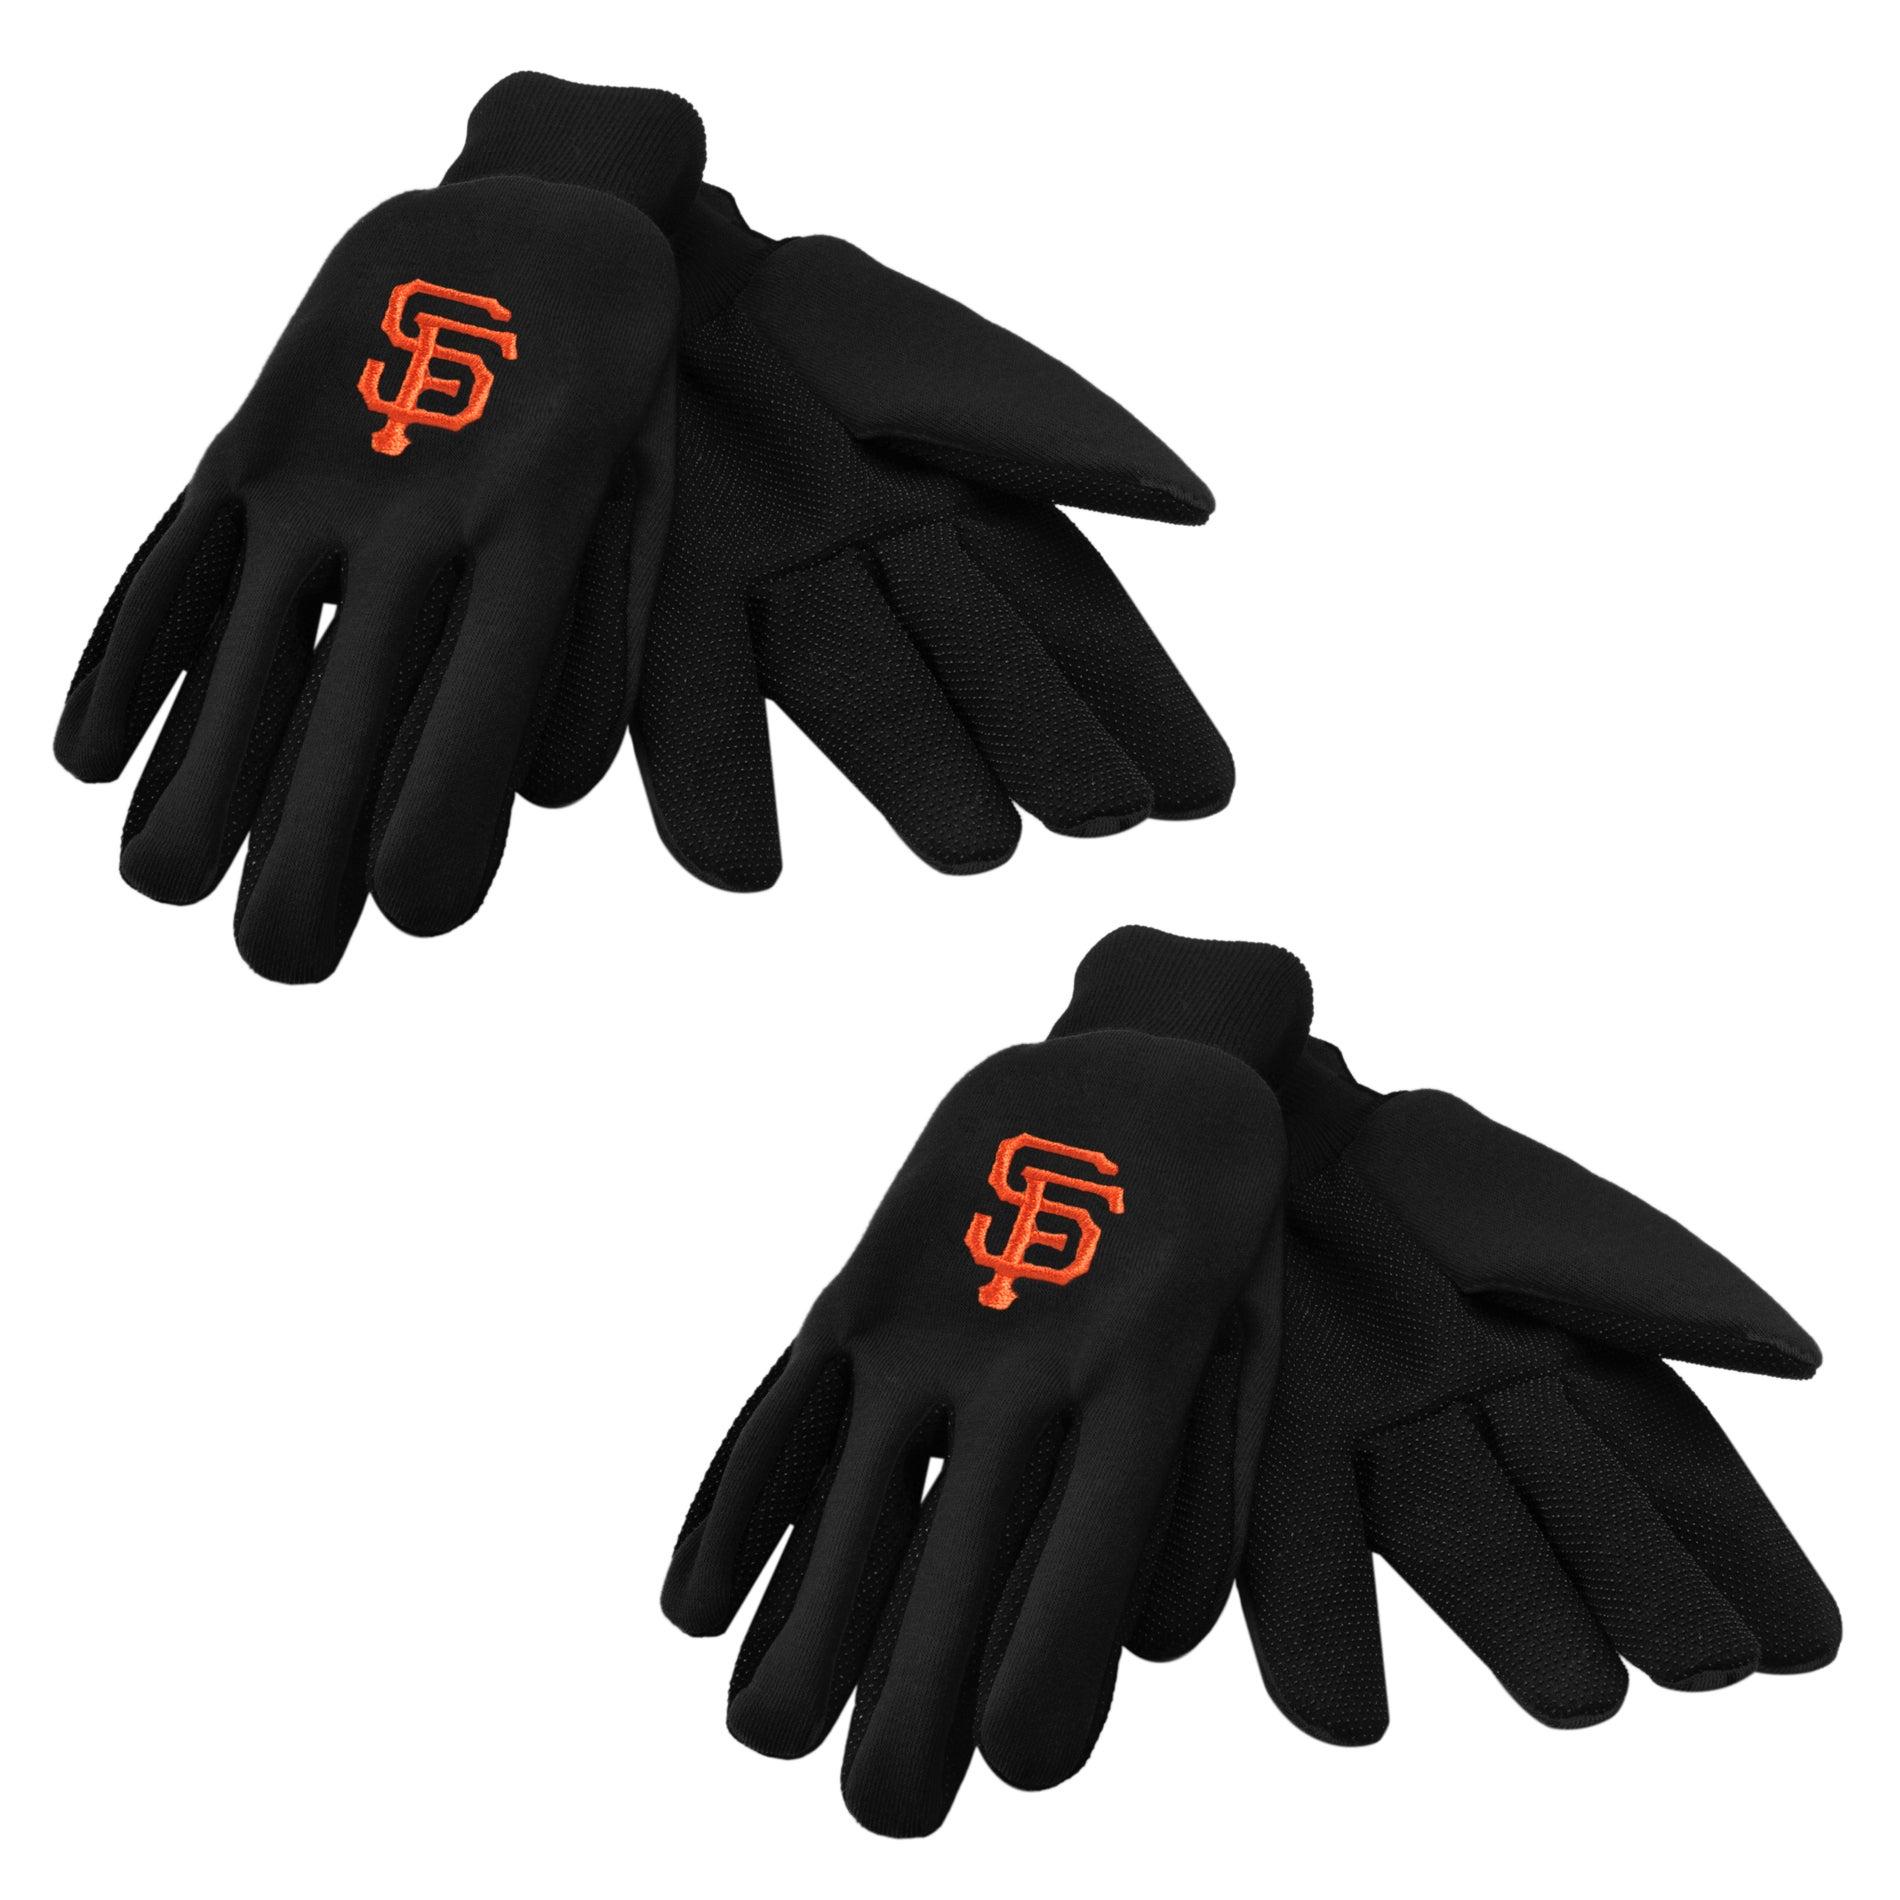 San Francisco Giants Two-tone Gloves (Set of 2 Pair)